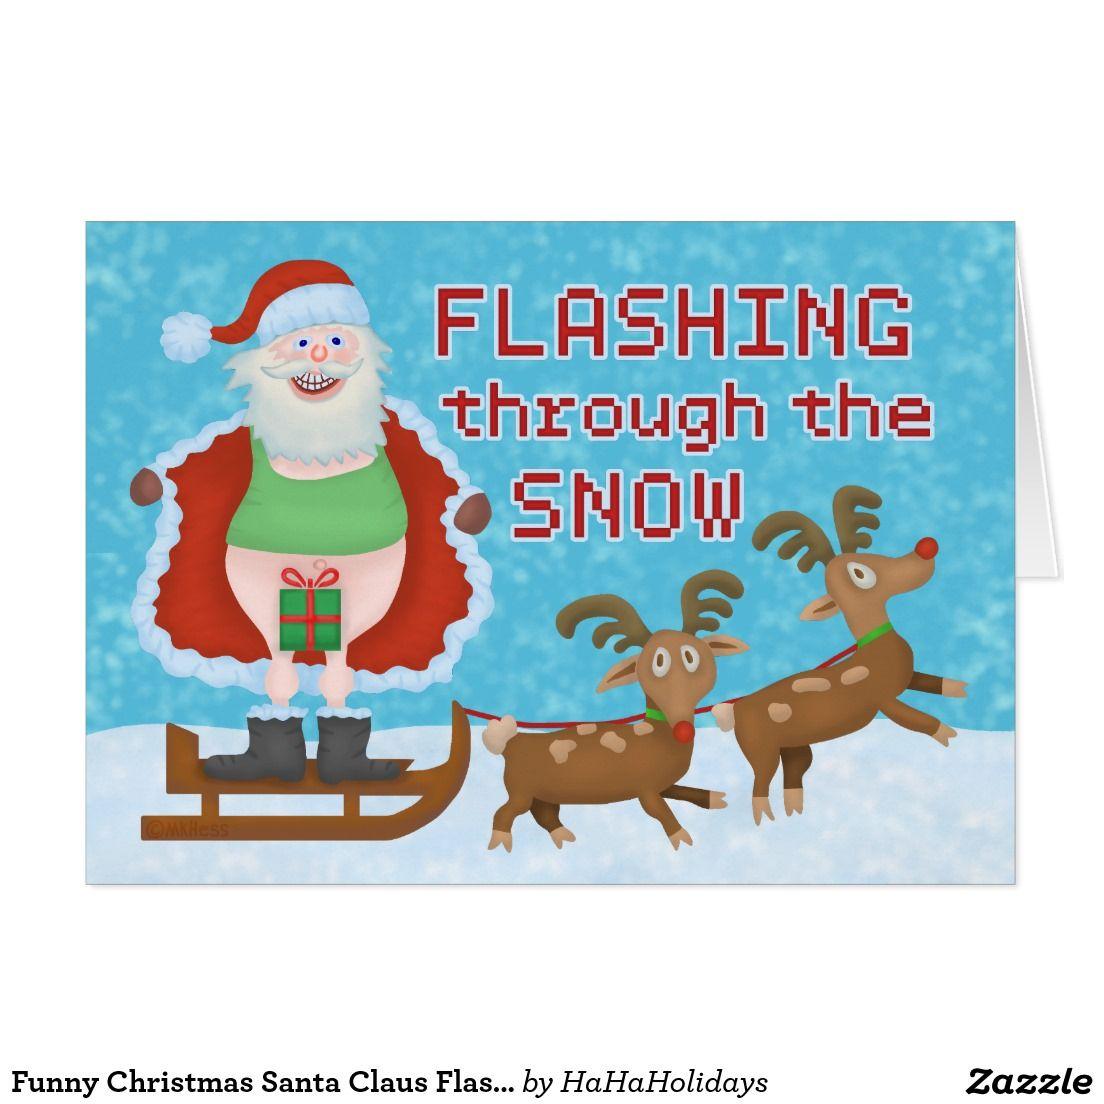 Funny Christmas Santa Claus Flashing Through The Snow Holiday